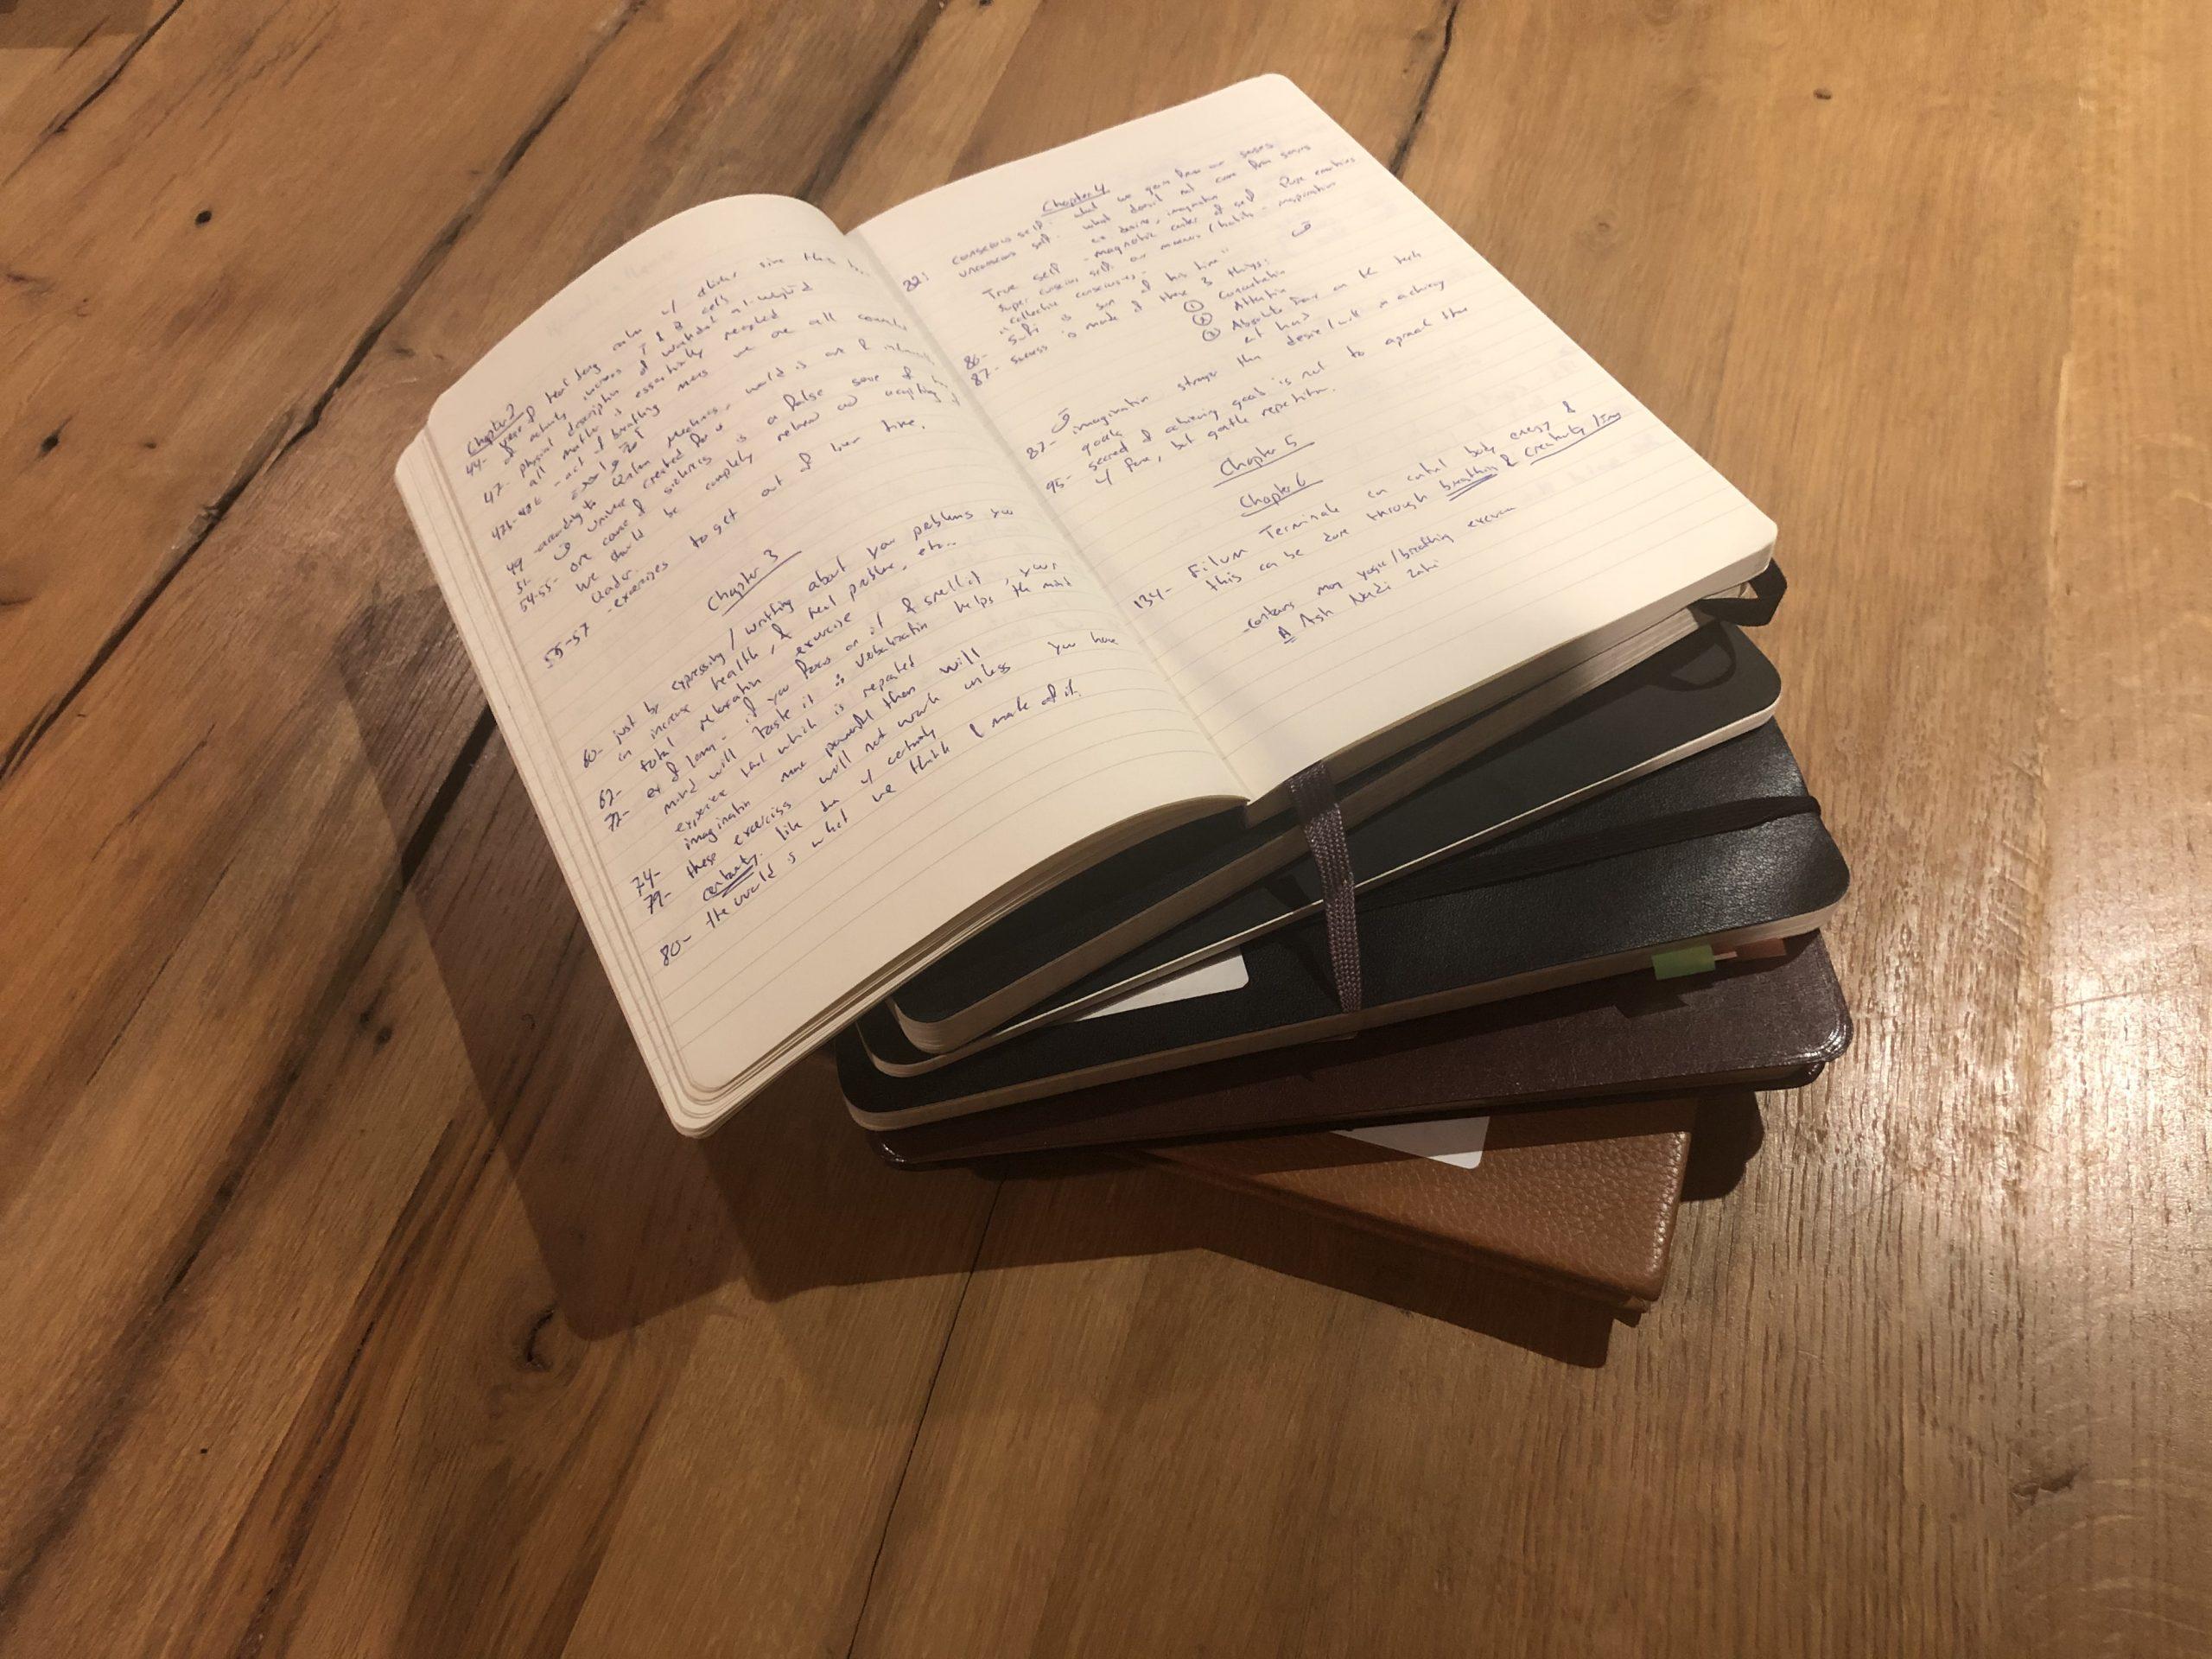 On Keeping a Ramadan Journal